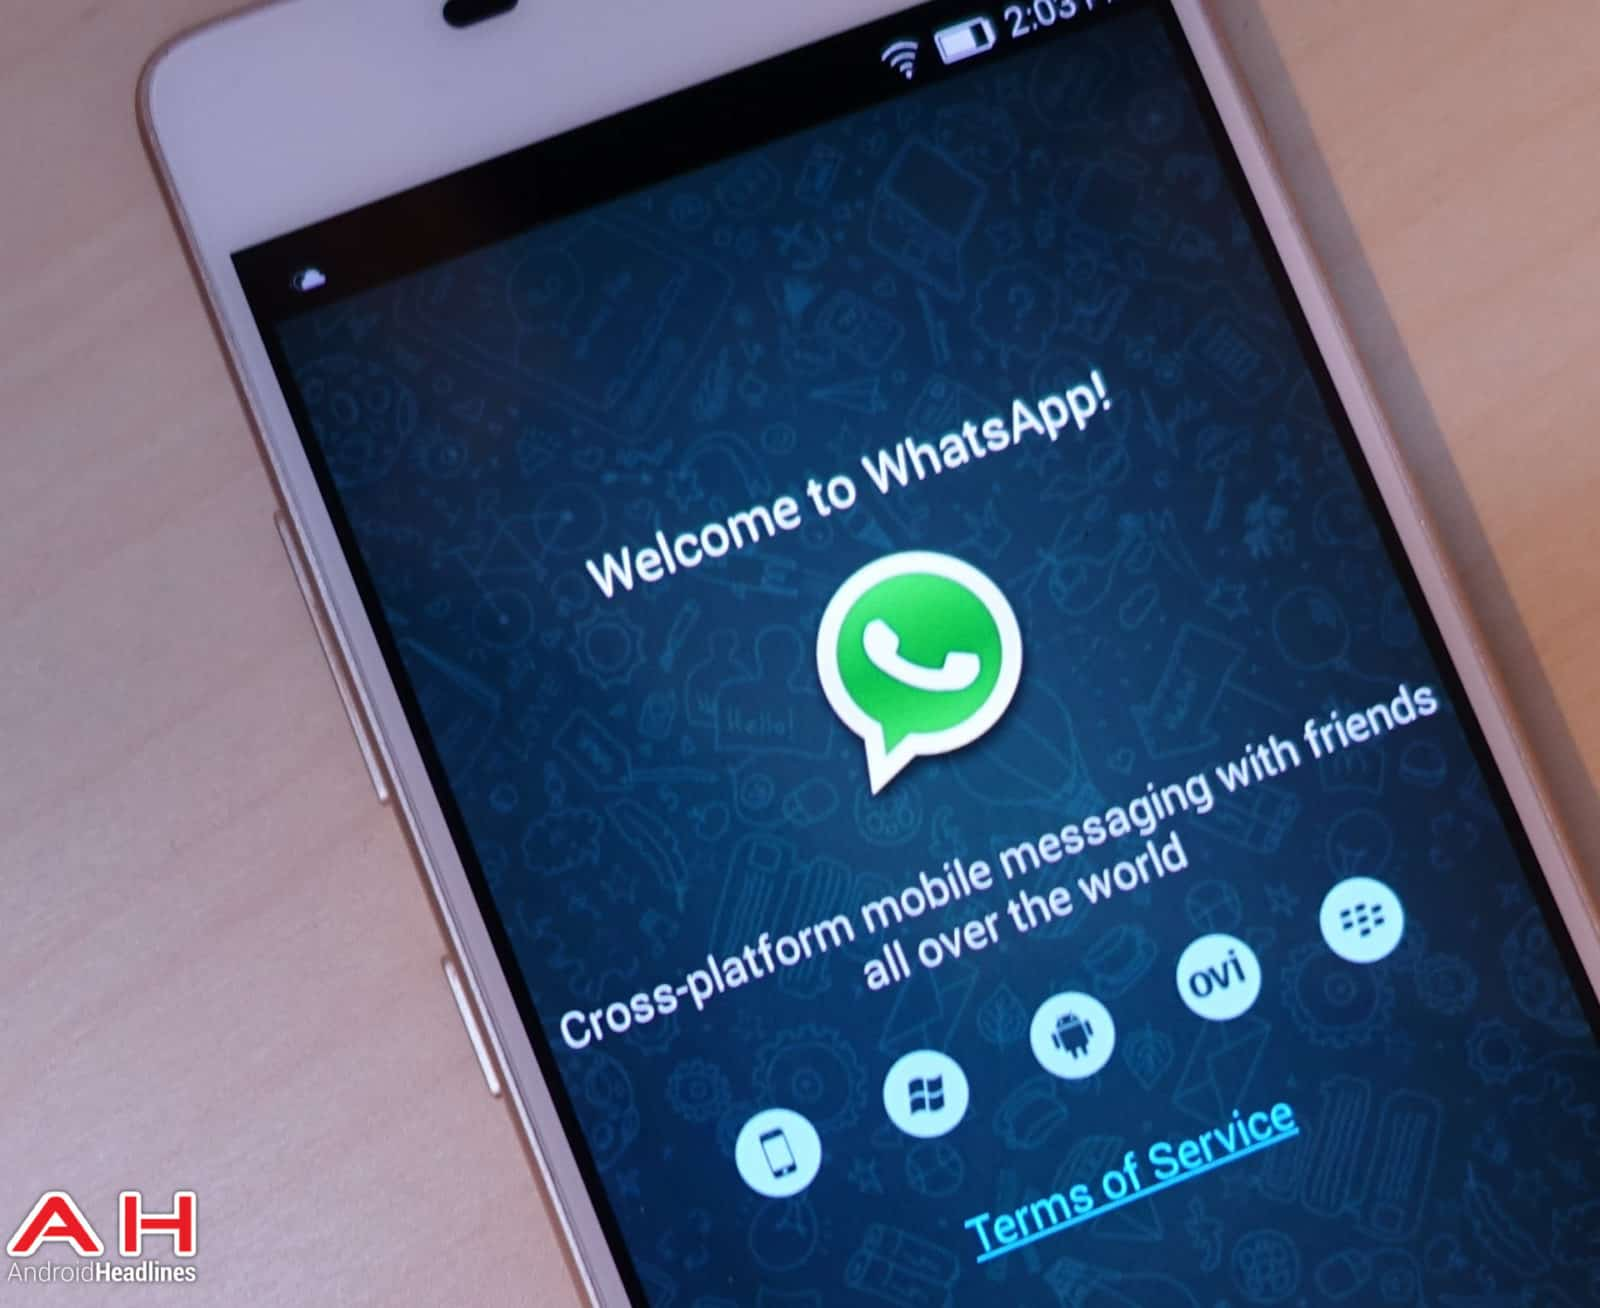 Whatsapp-AH-02991